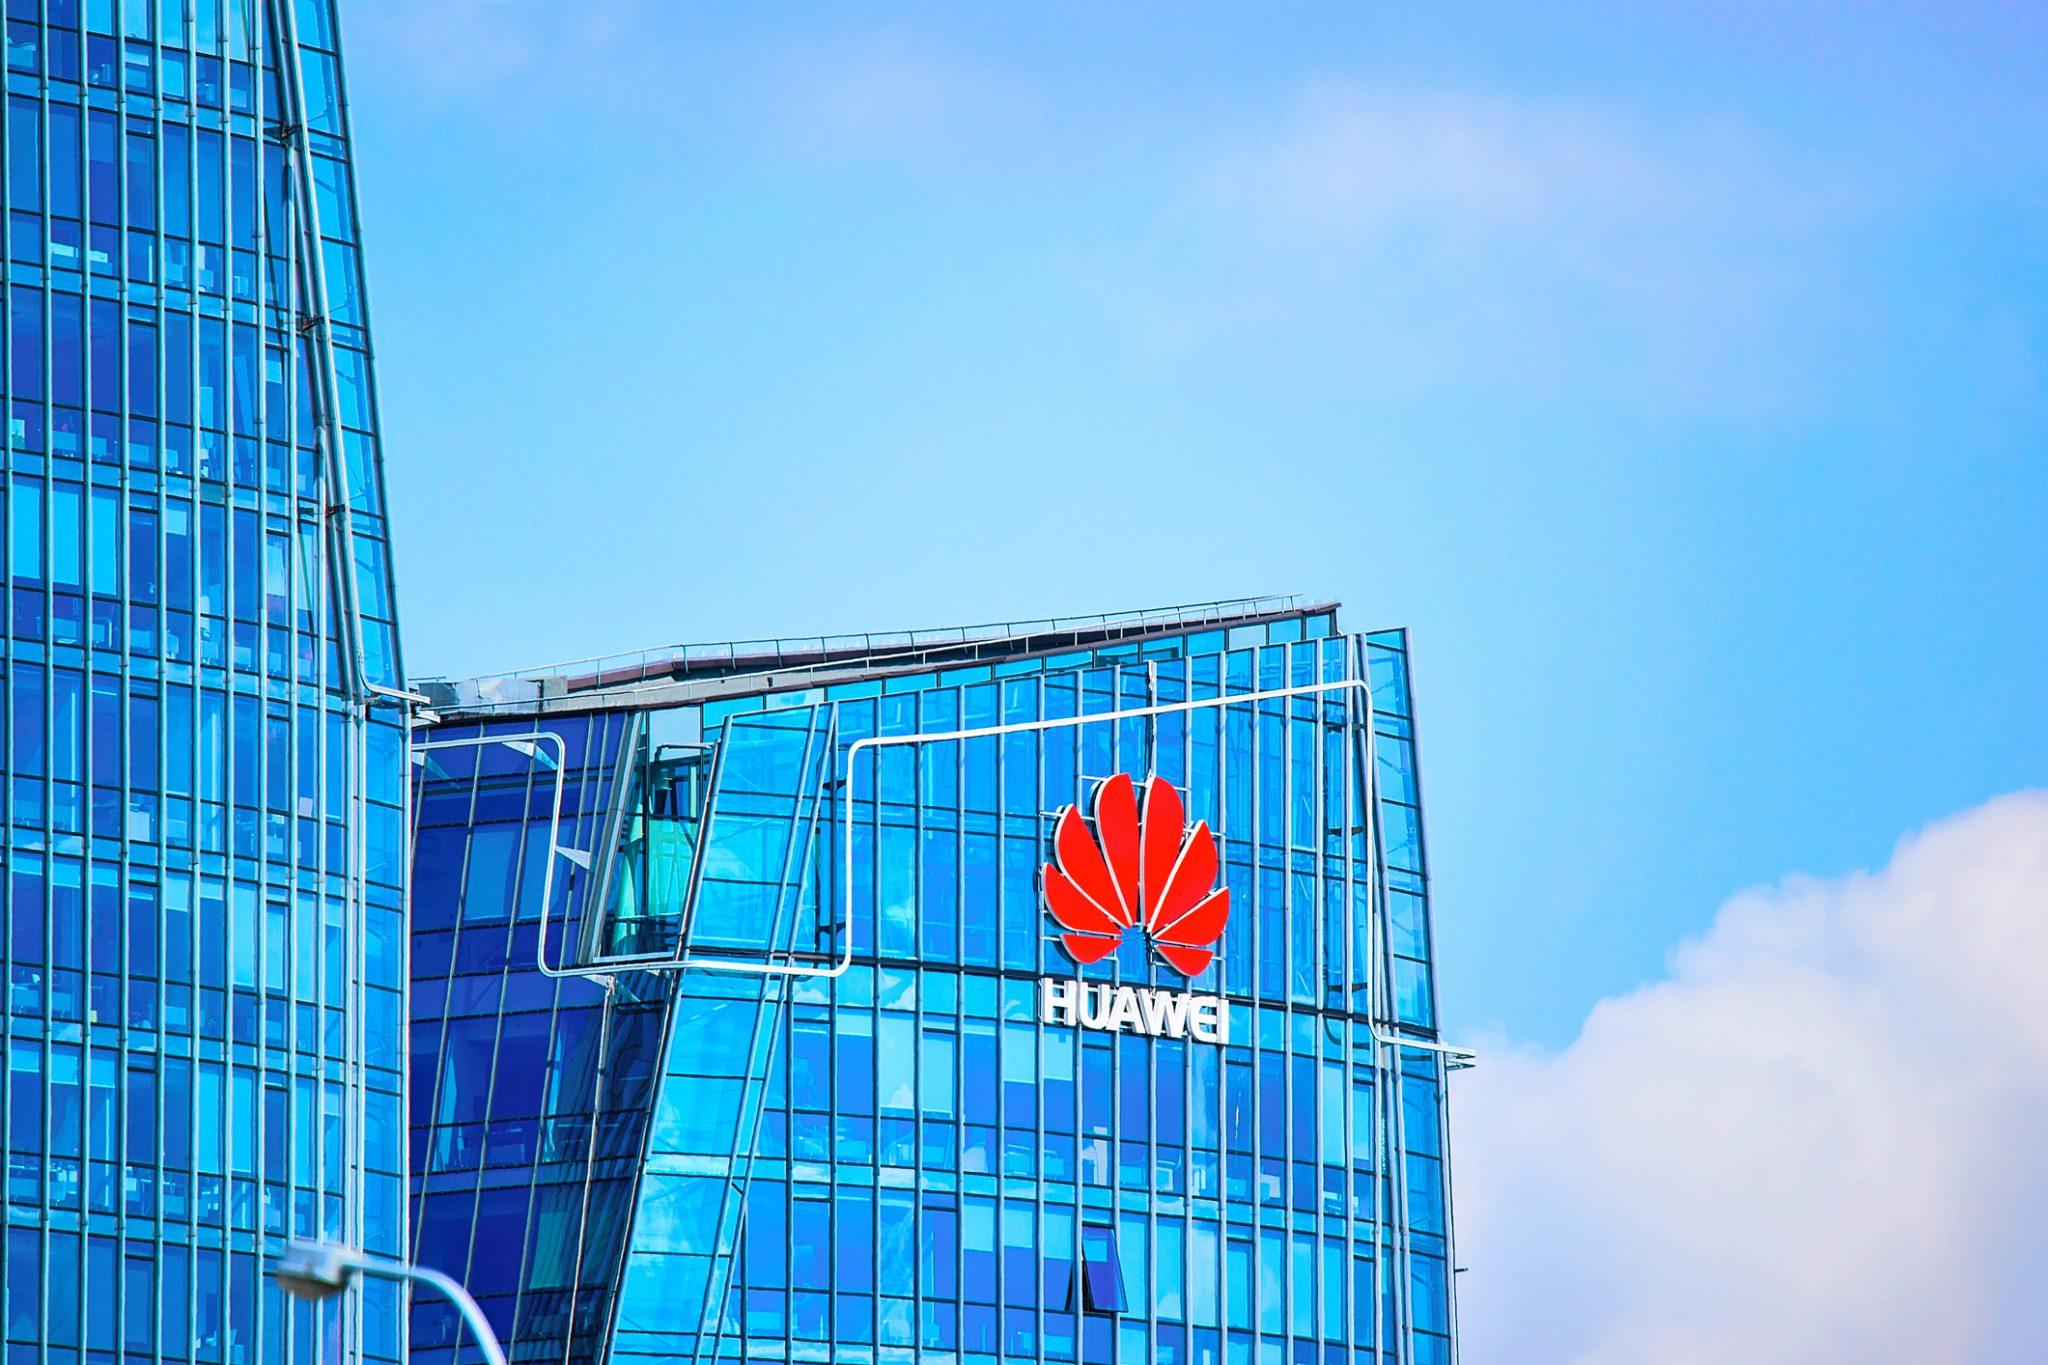 Huawei smartphone smartphones apple iphone samsung